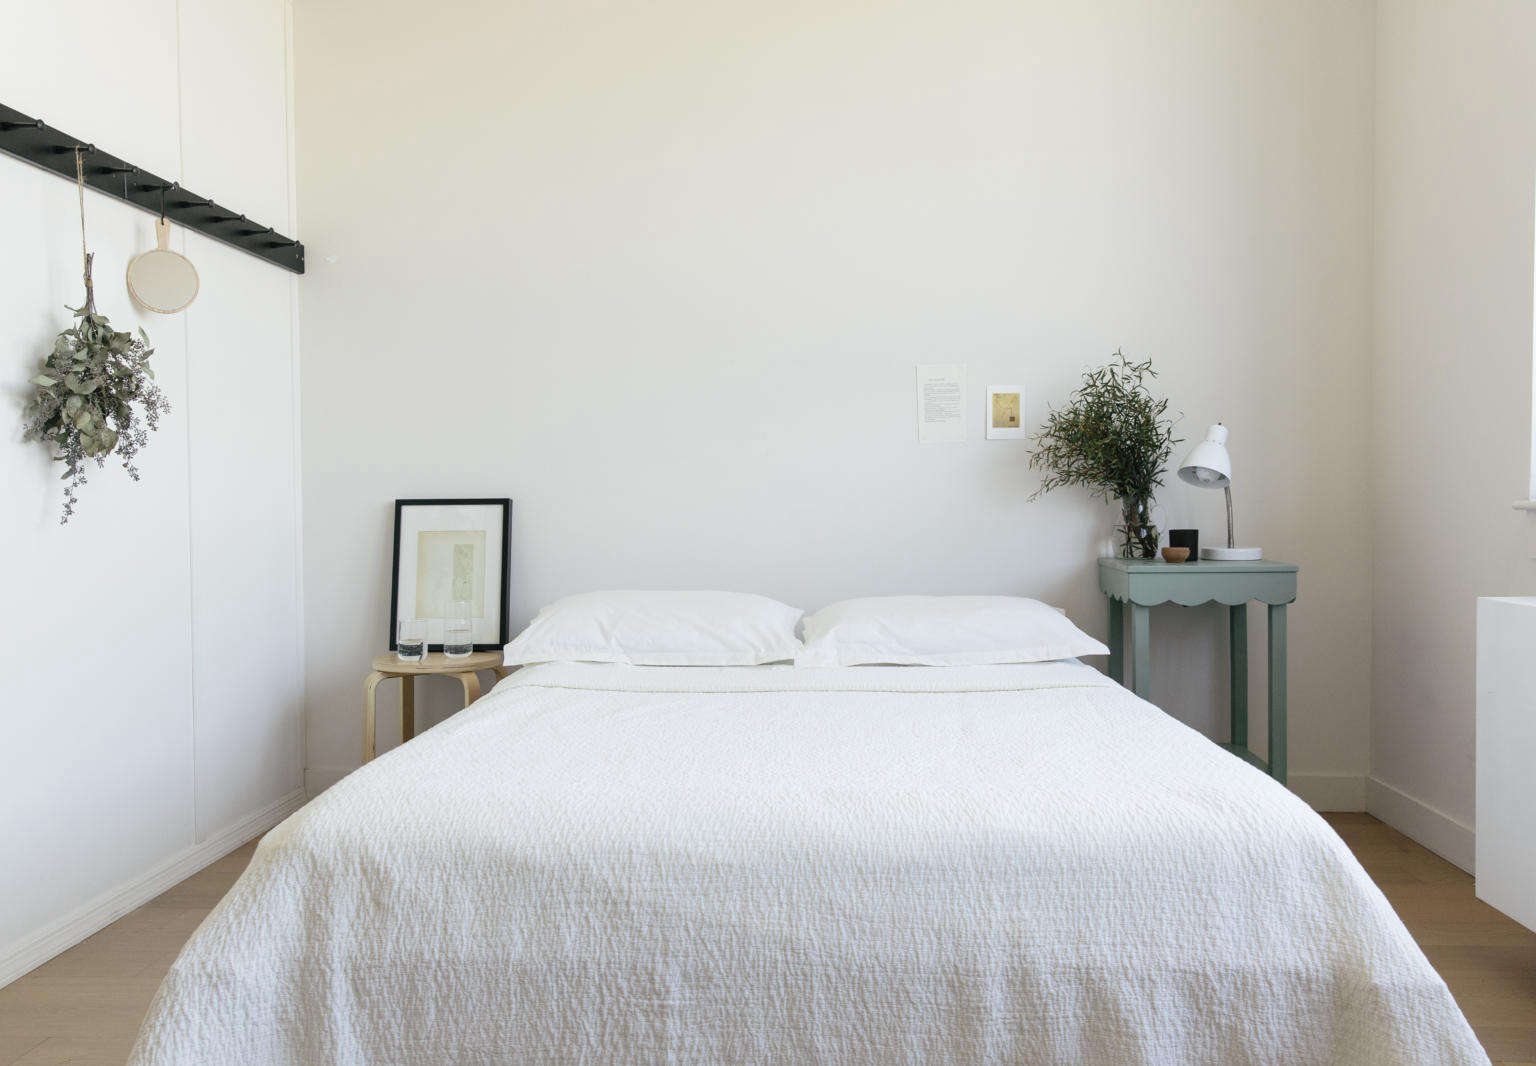 sferra alma sheets bed full annie quigley mel walbridge 1536x1066